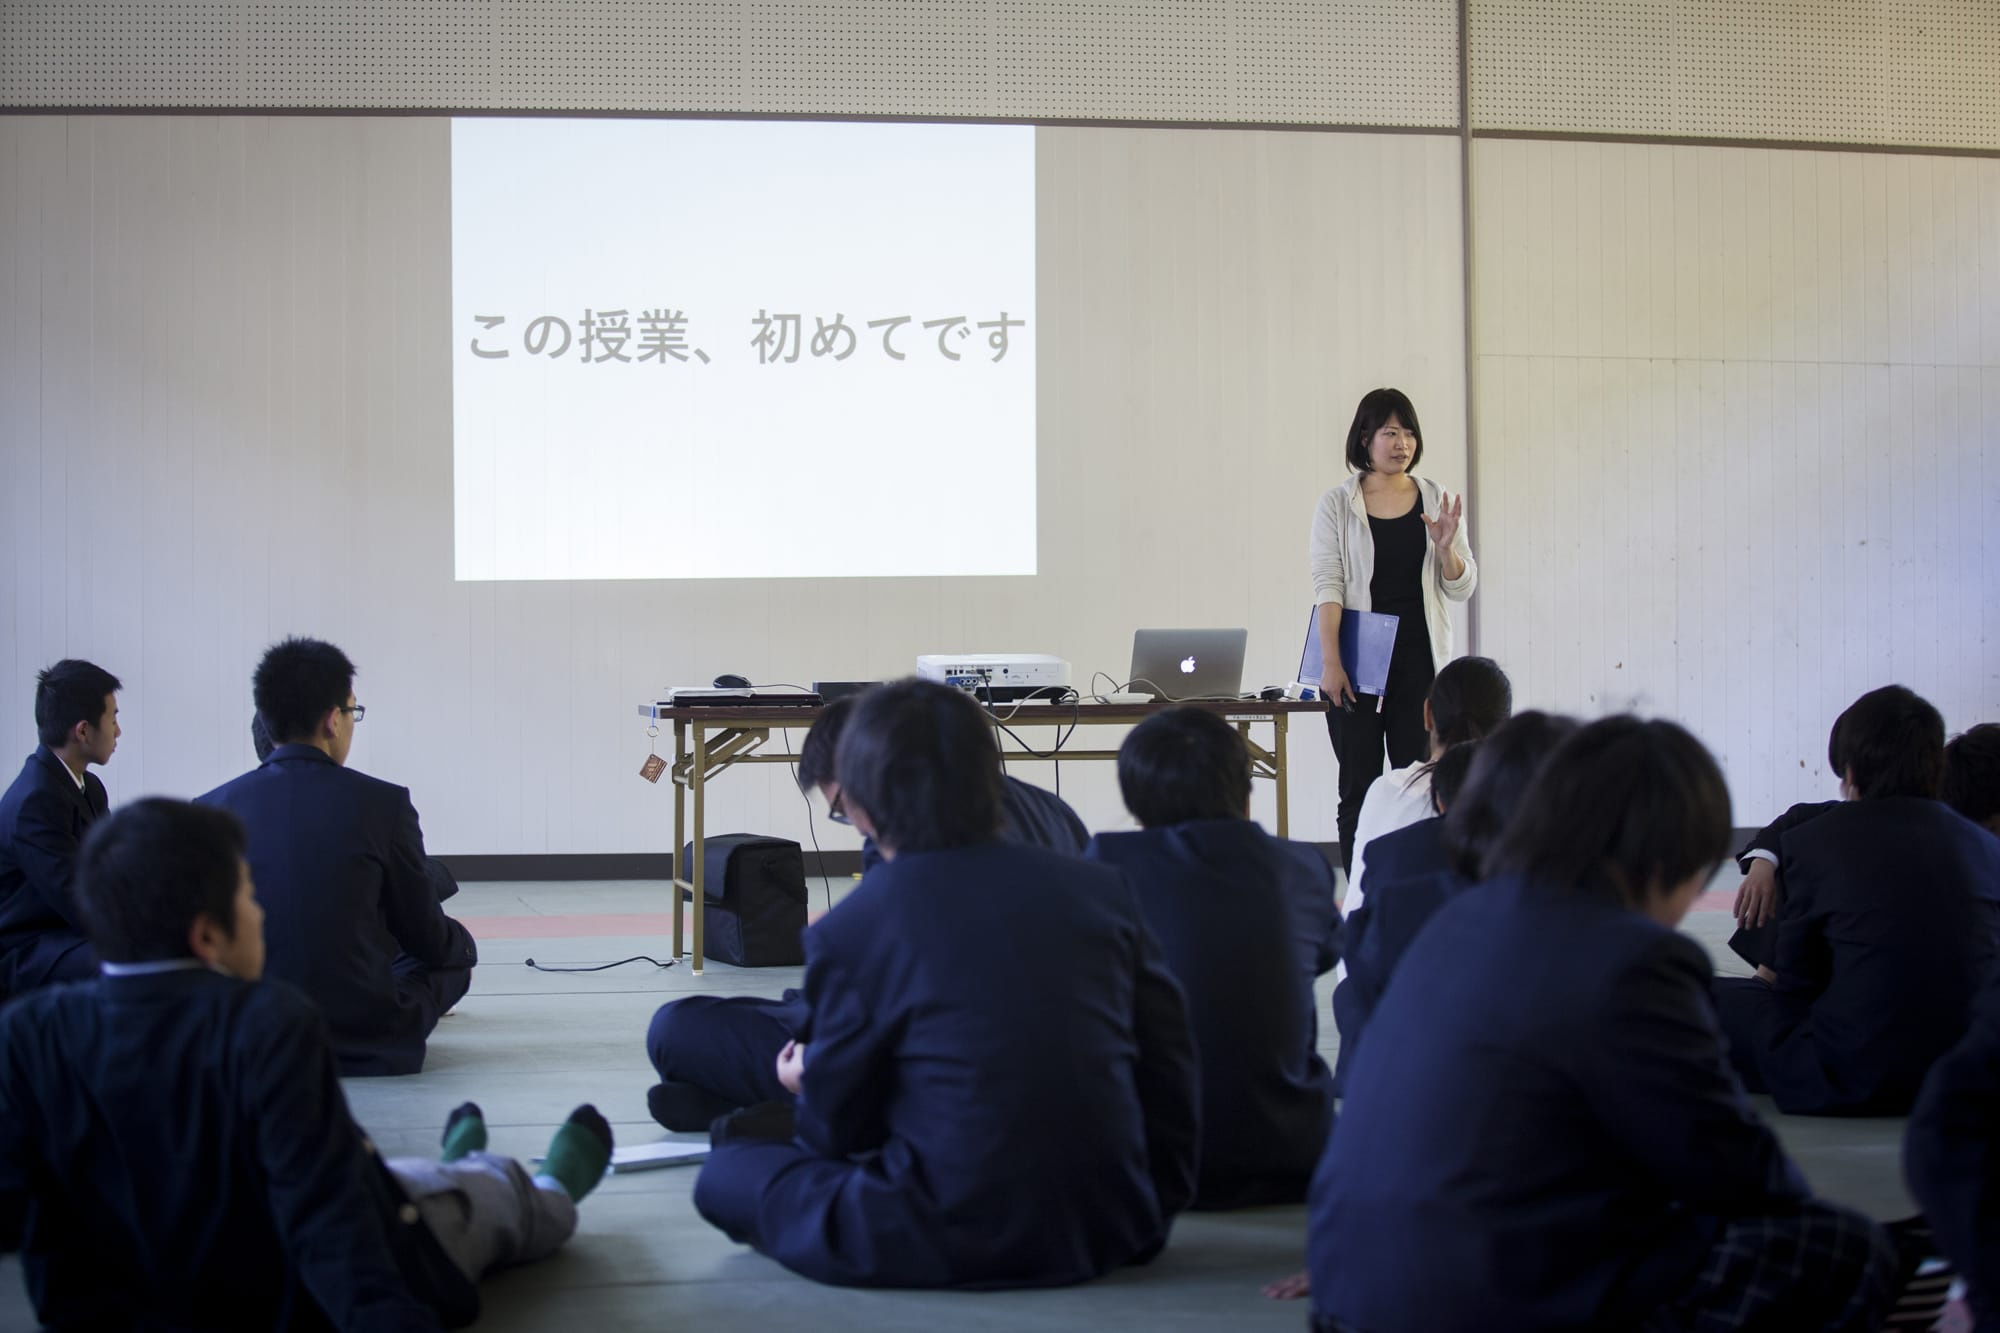 moriyama02-sozogaku02